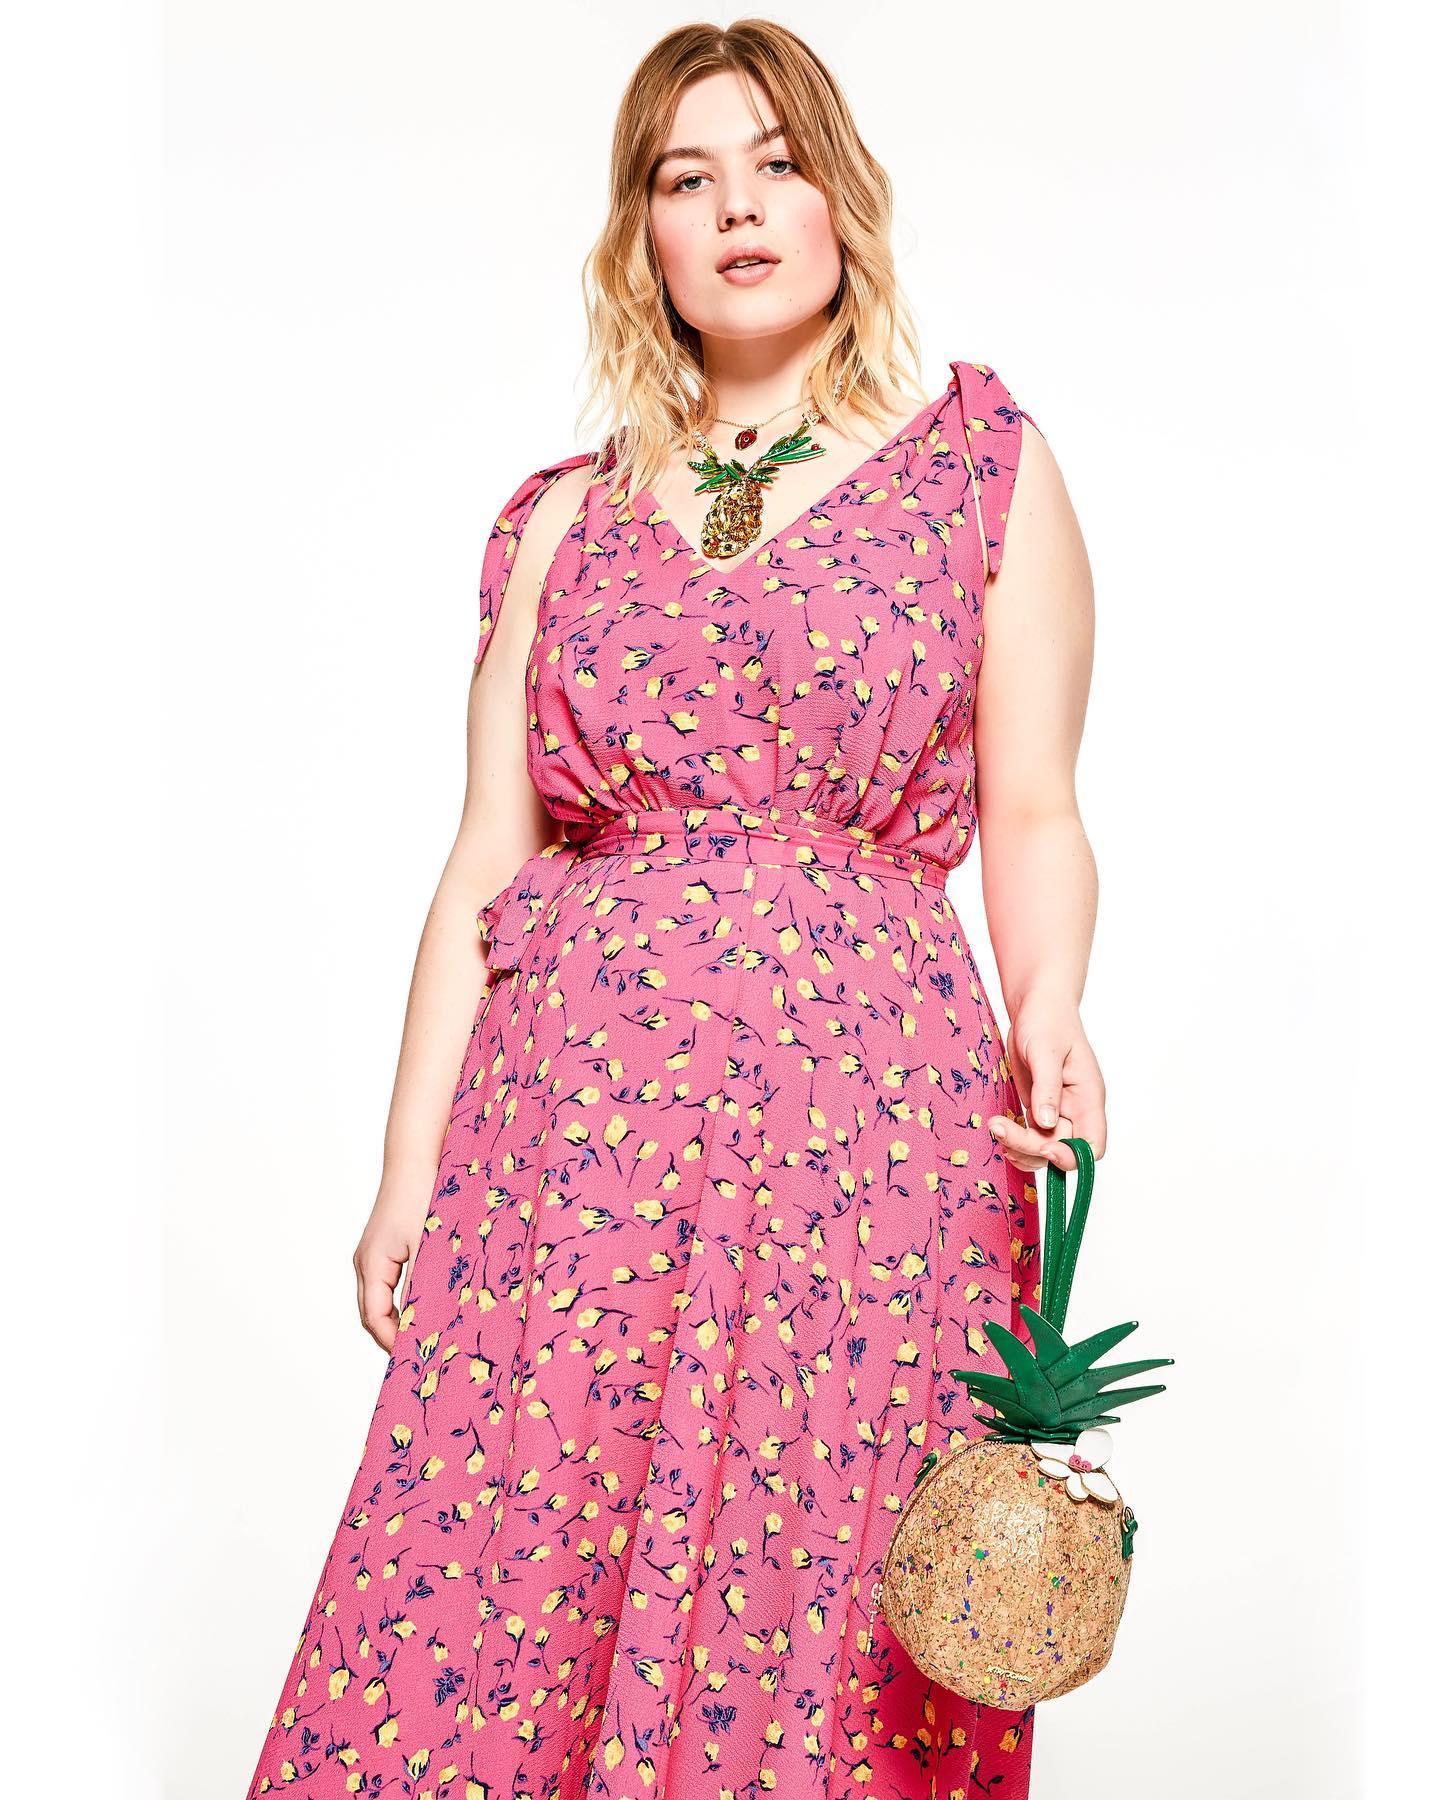 ff9a971fcffb Shop Betsey Johnson Dresses, Shoes, Handbags, Accesories & more!